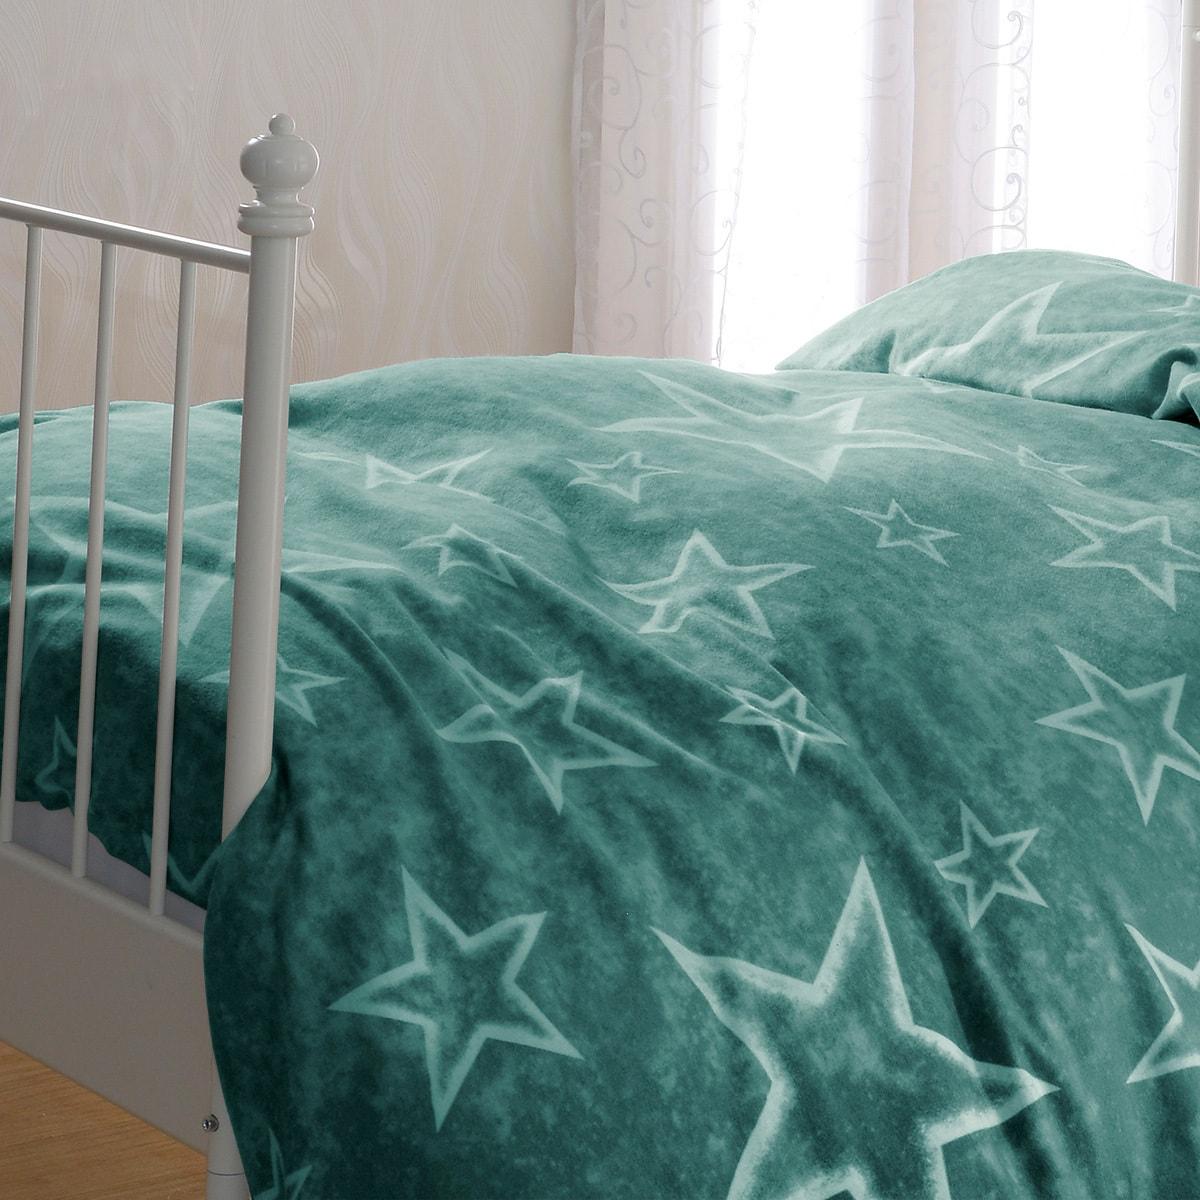 bettwarenshop biber bettw sche sterne gr n g nstig online. Black Bedroom Furniture Sets. Home Design Ideas